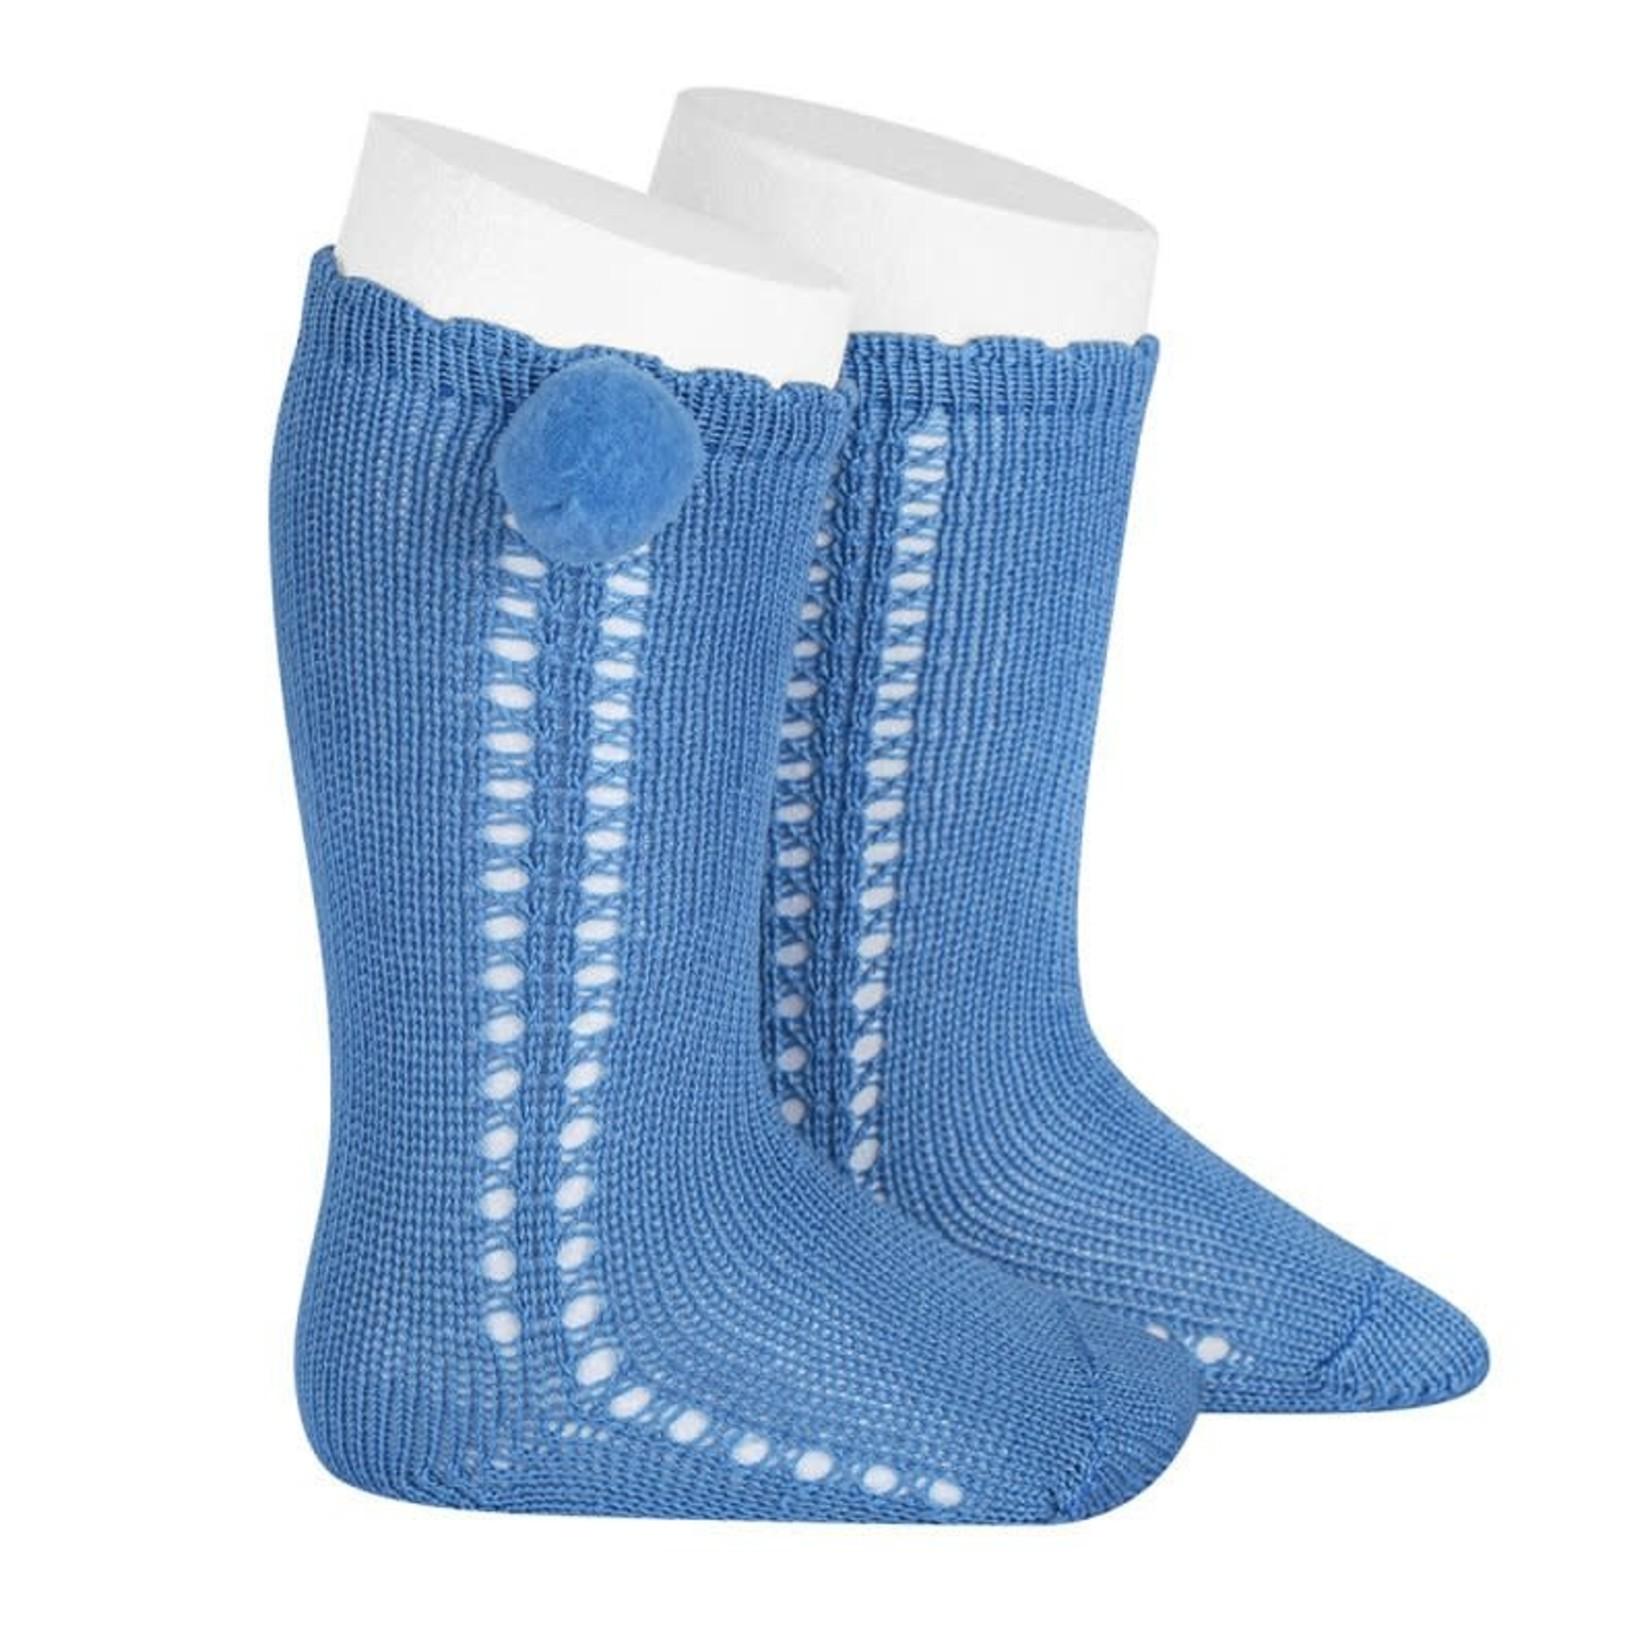 Condor Socks Pompom - Maya